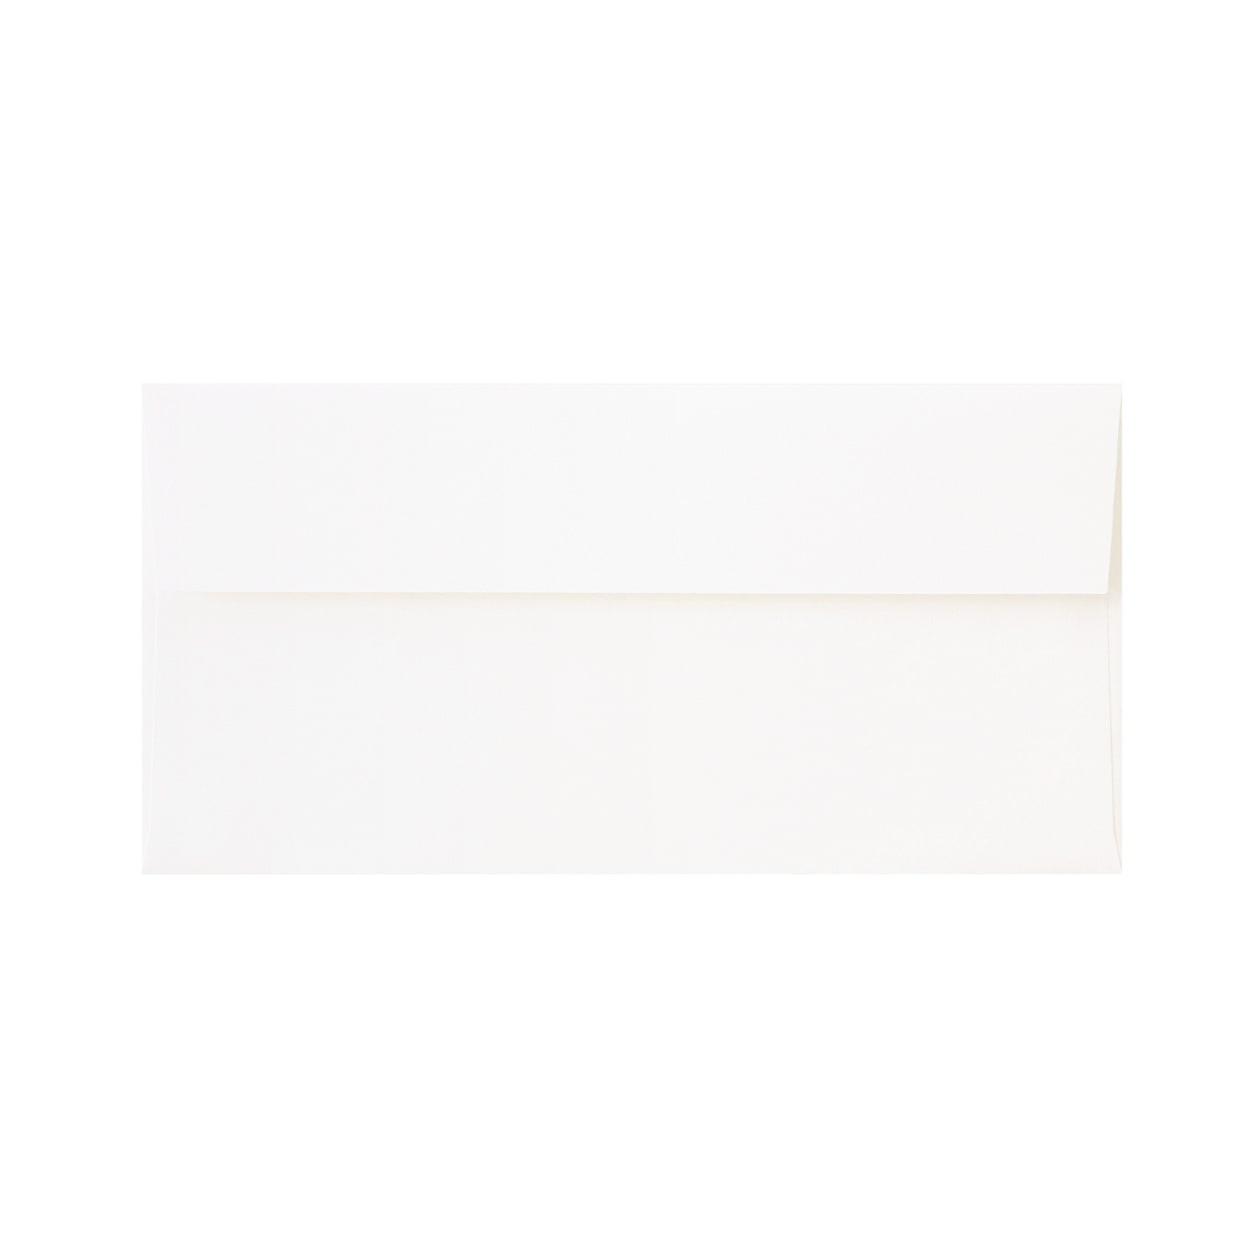 DLカマス封筒 コットン スノーホワイト 116.3g